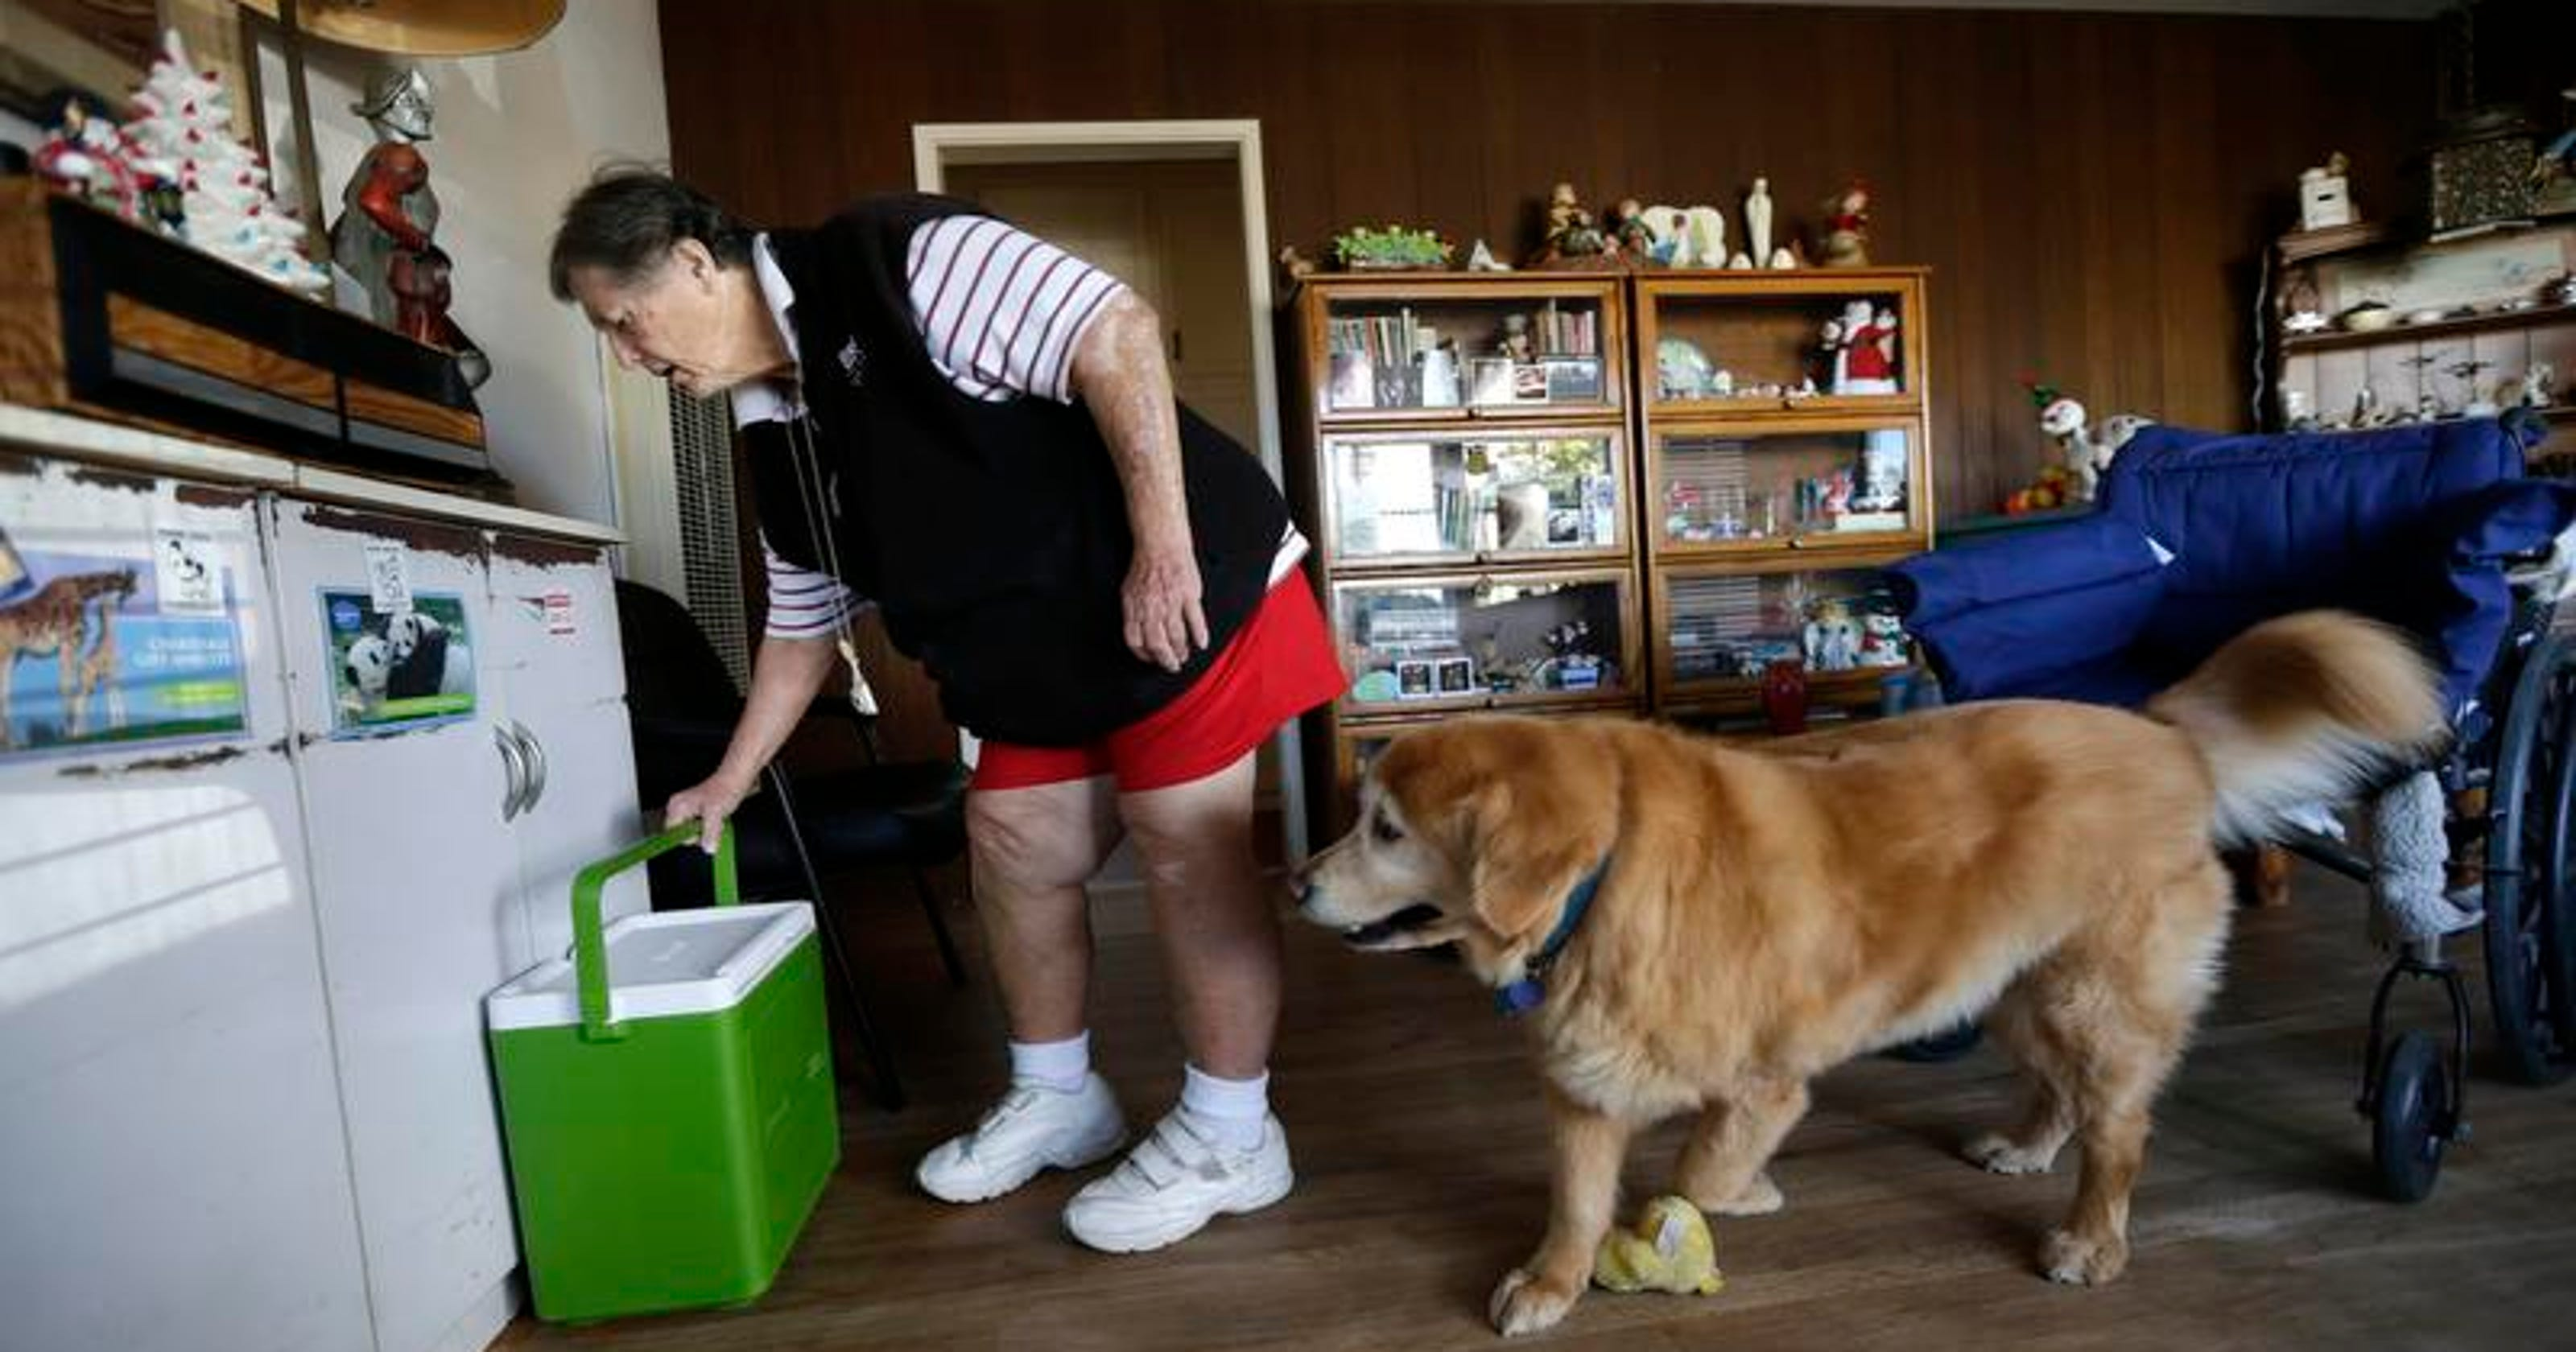 Seniors, disabled get help feeding furry friends